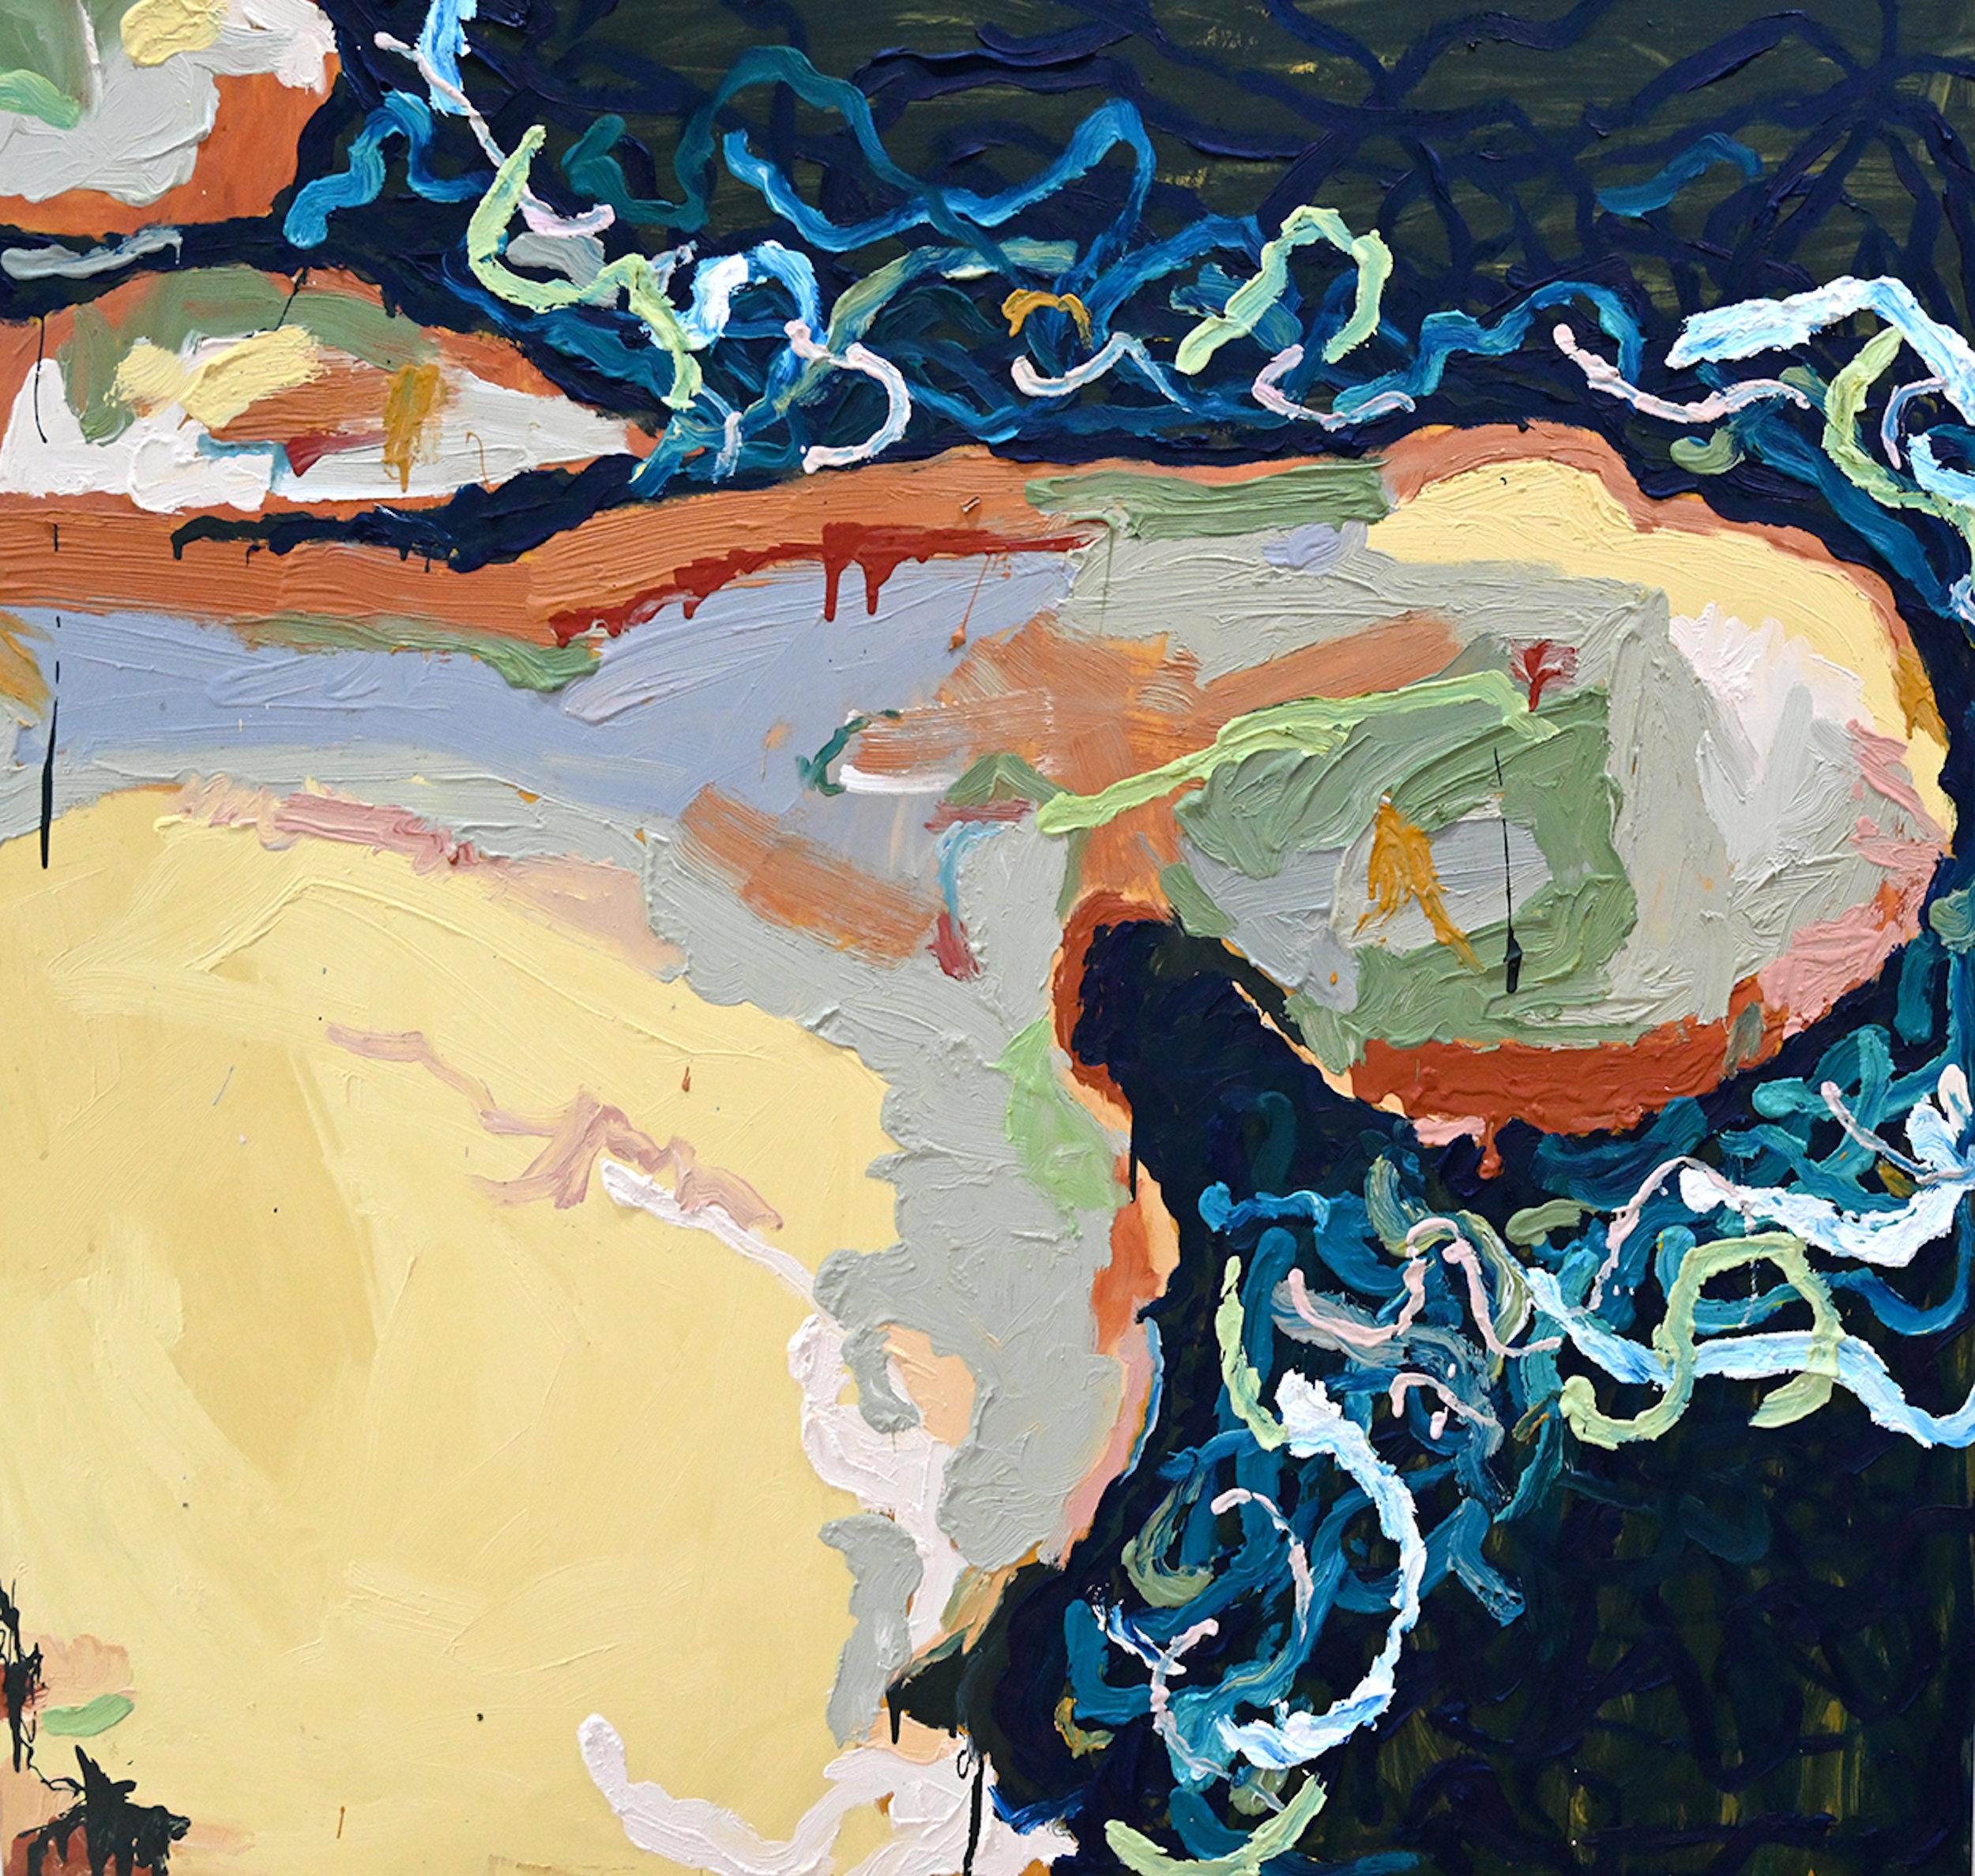 Michelle Teear  Munmorah Rock Shelf  2019 oil on plywood 120 x 120cm $2200.00